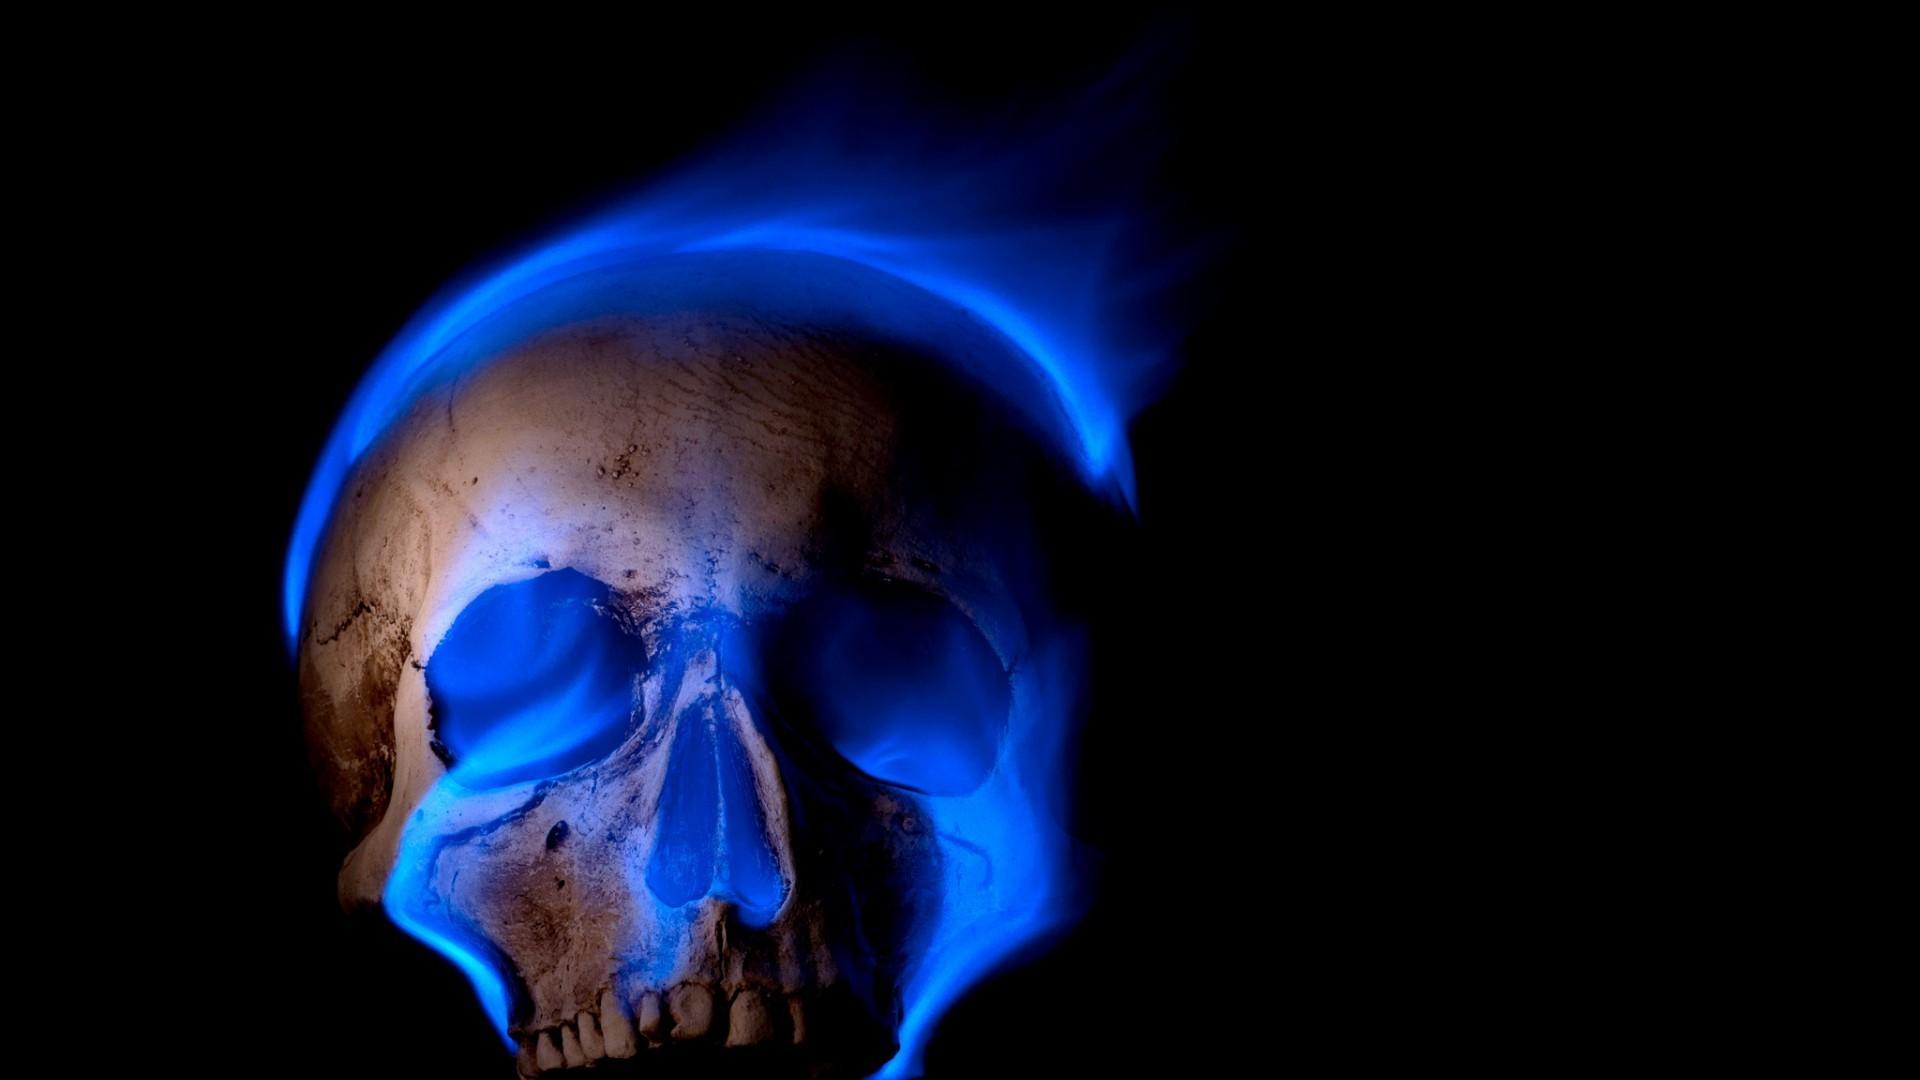 General digital art skull black background teeth burning blue  flames fire death spooky Gothic